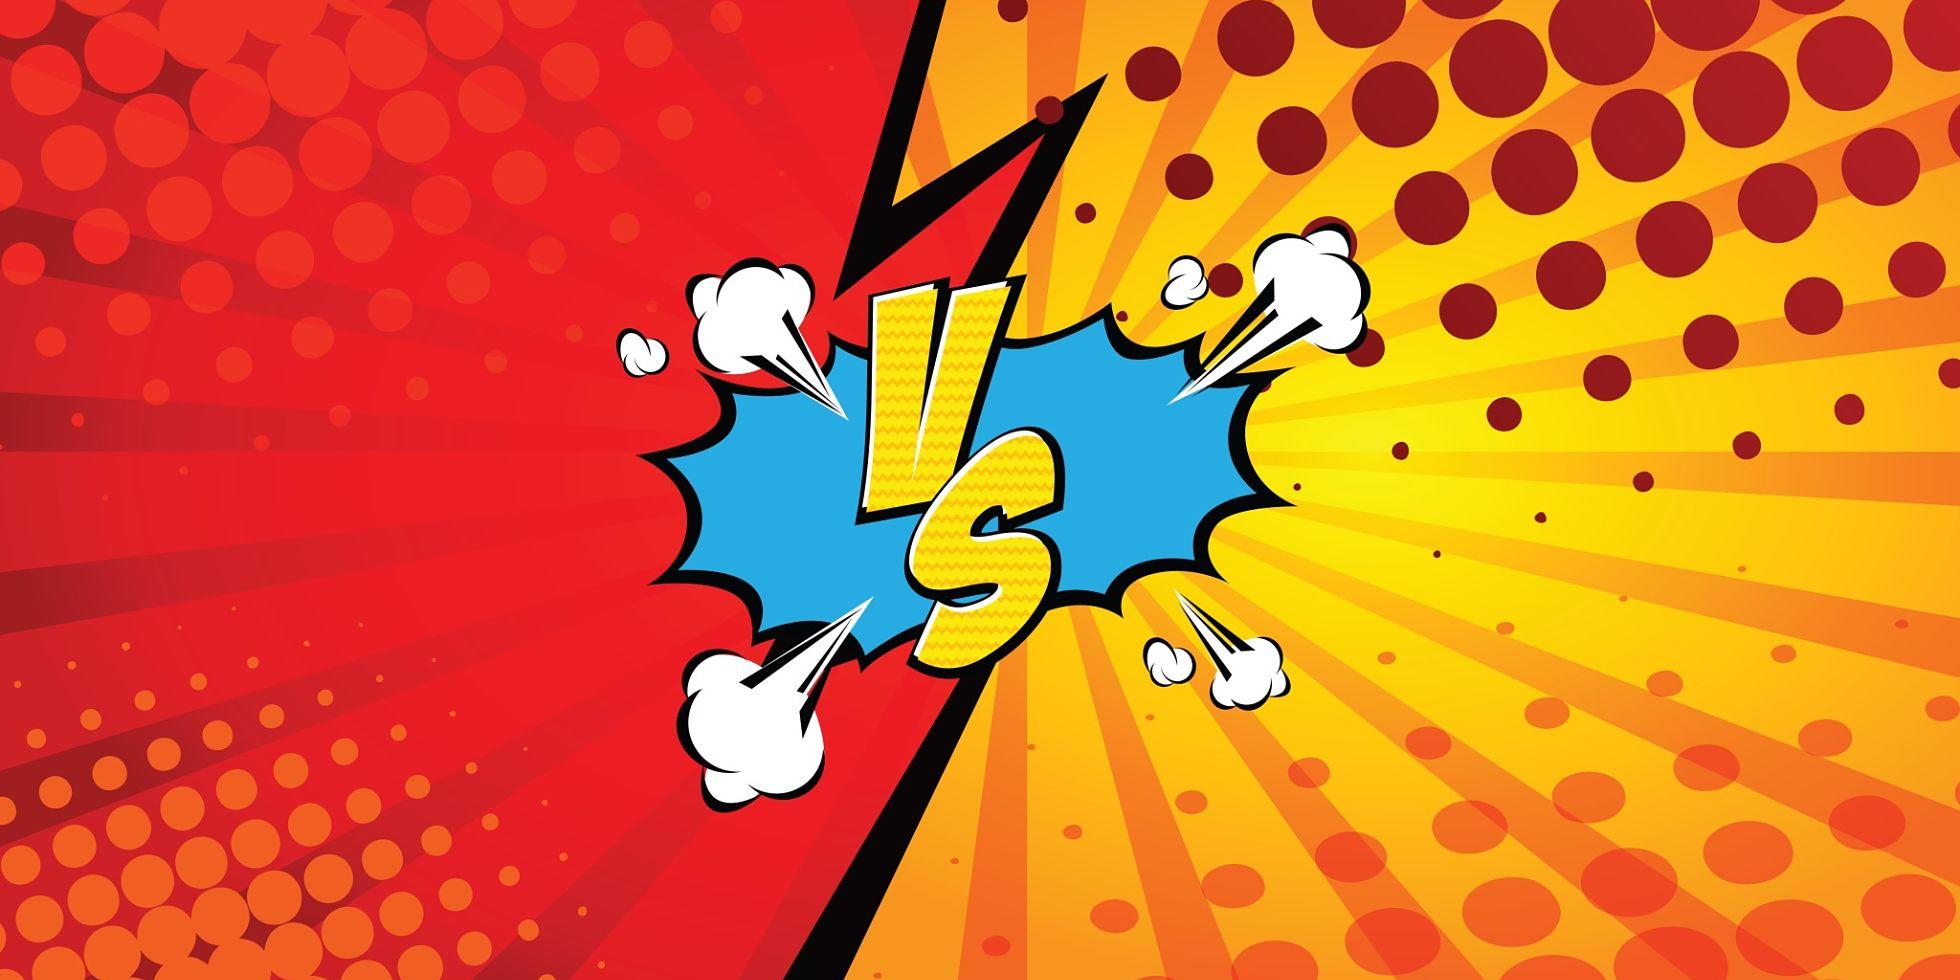 The Team creative branding agency. Brand vs Service Design